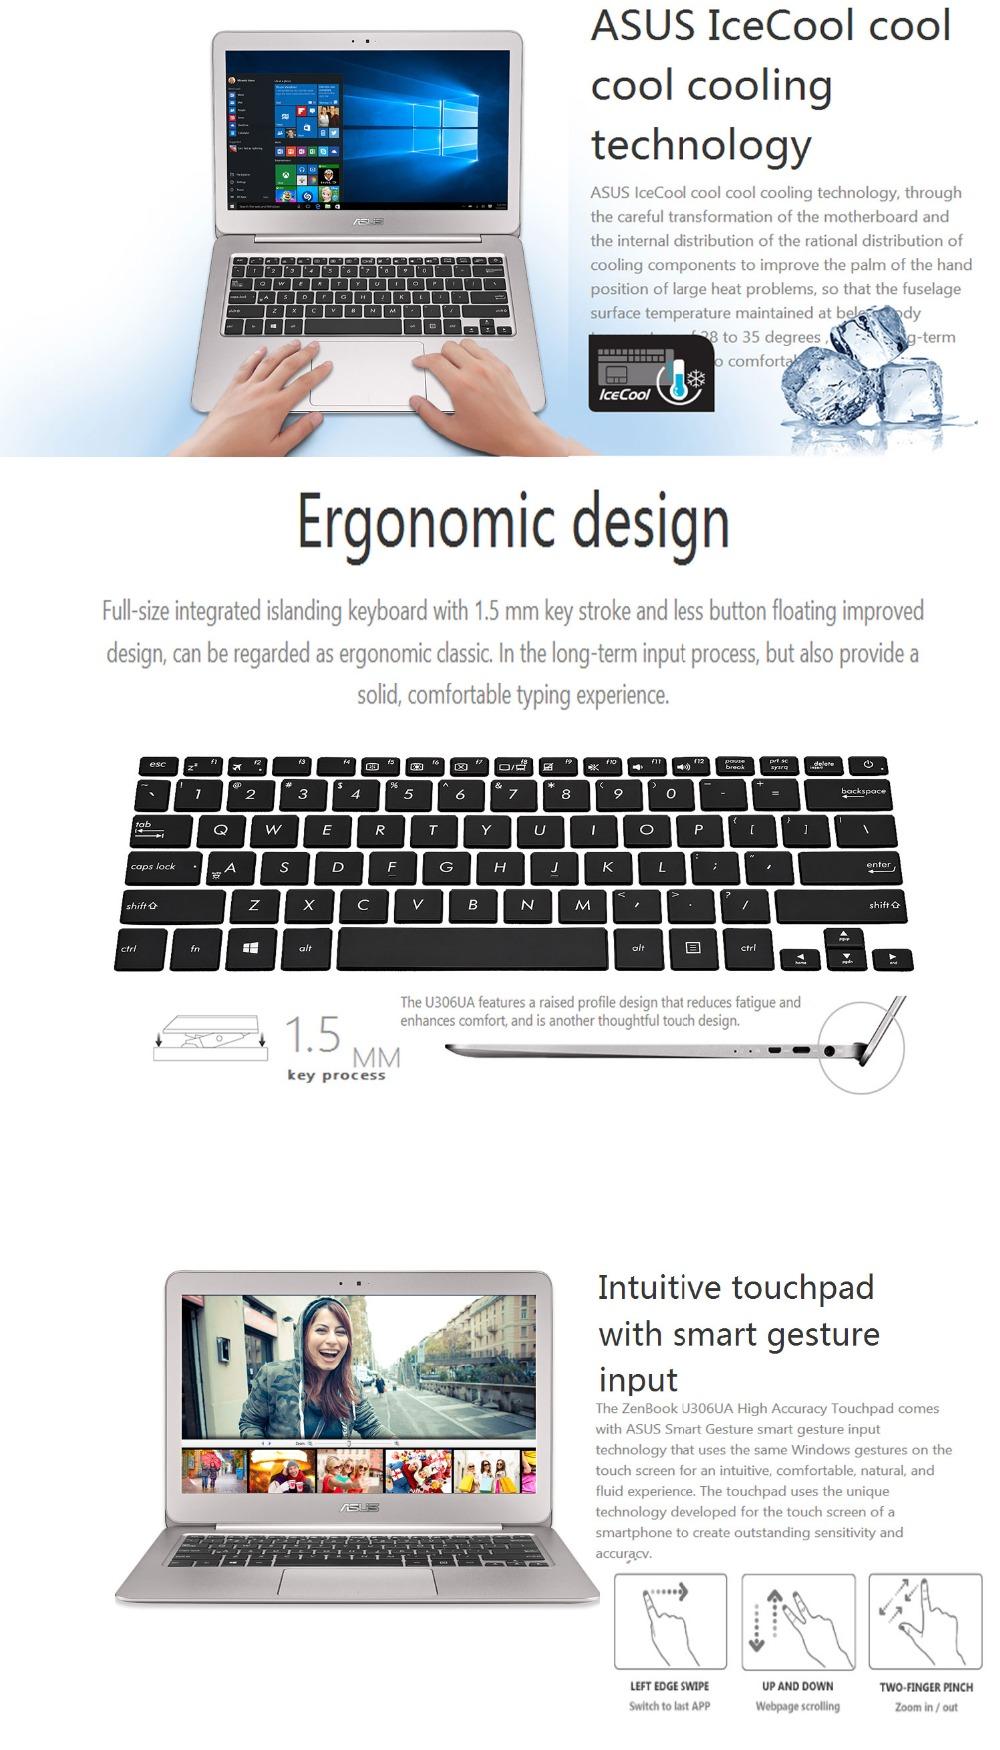 U306UA-_-Laptop-_-ASUS-China_04